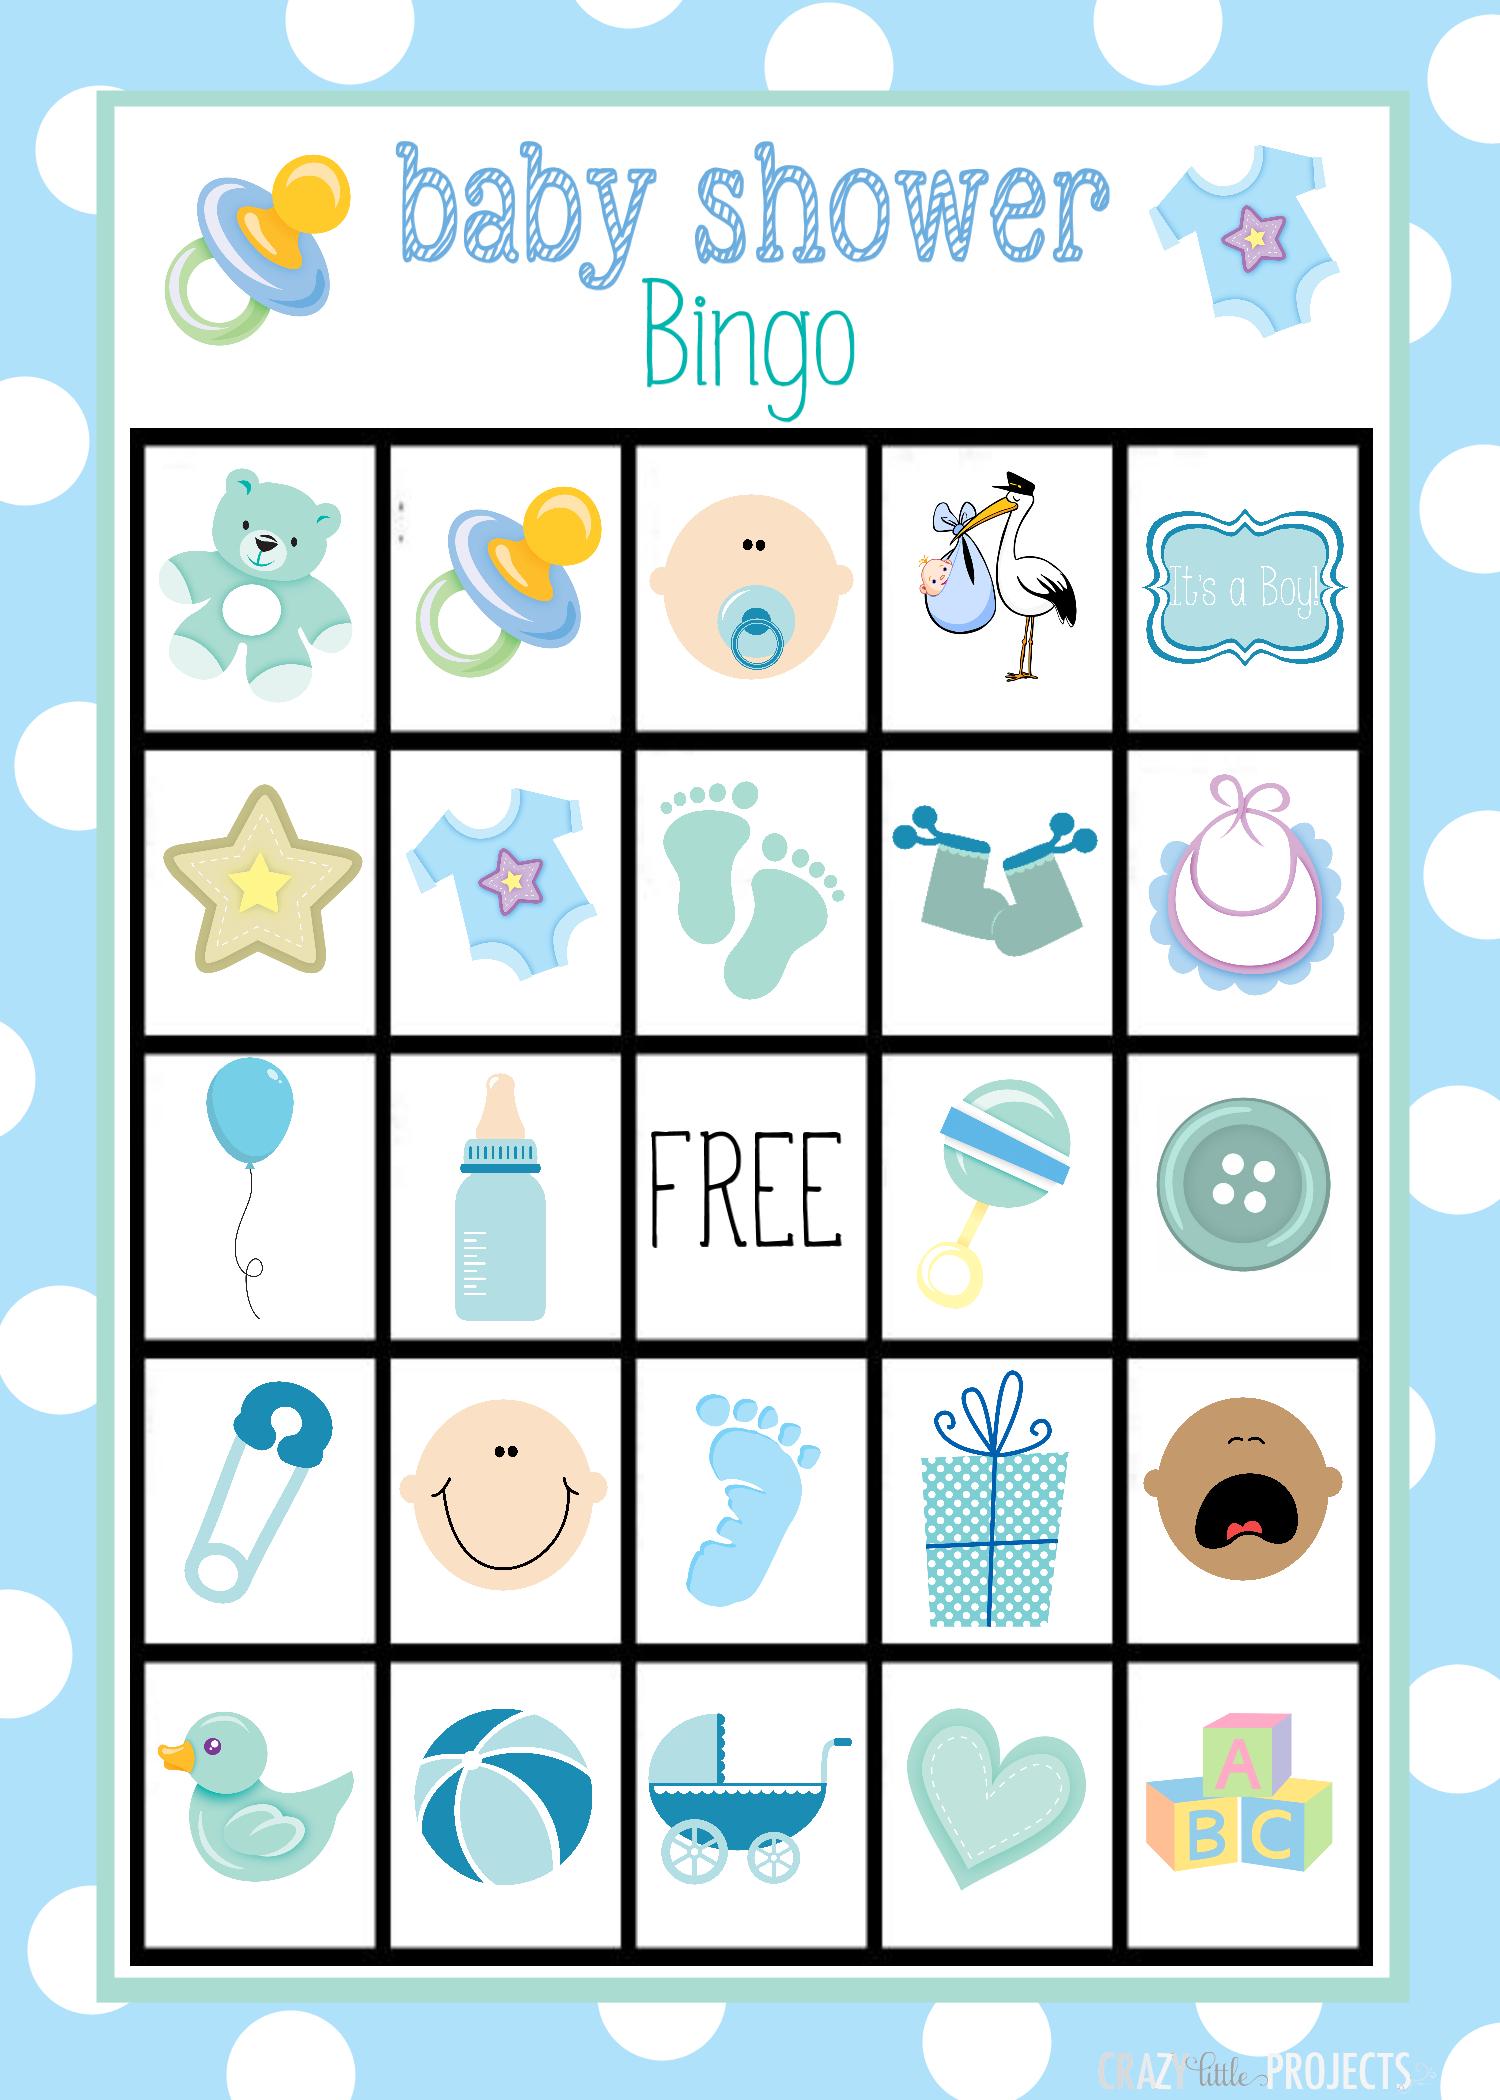 Printable Baby Shower Bingo Cards | Baby Shower Bingo, Free